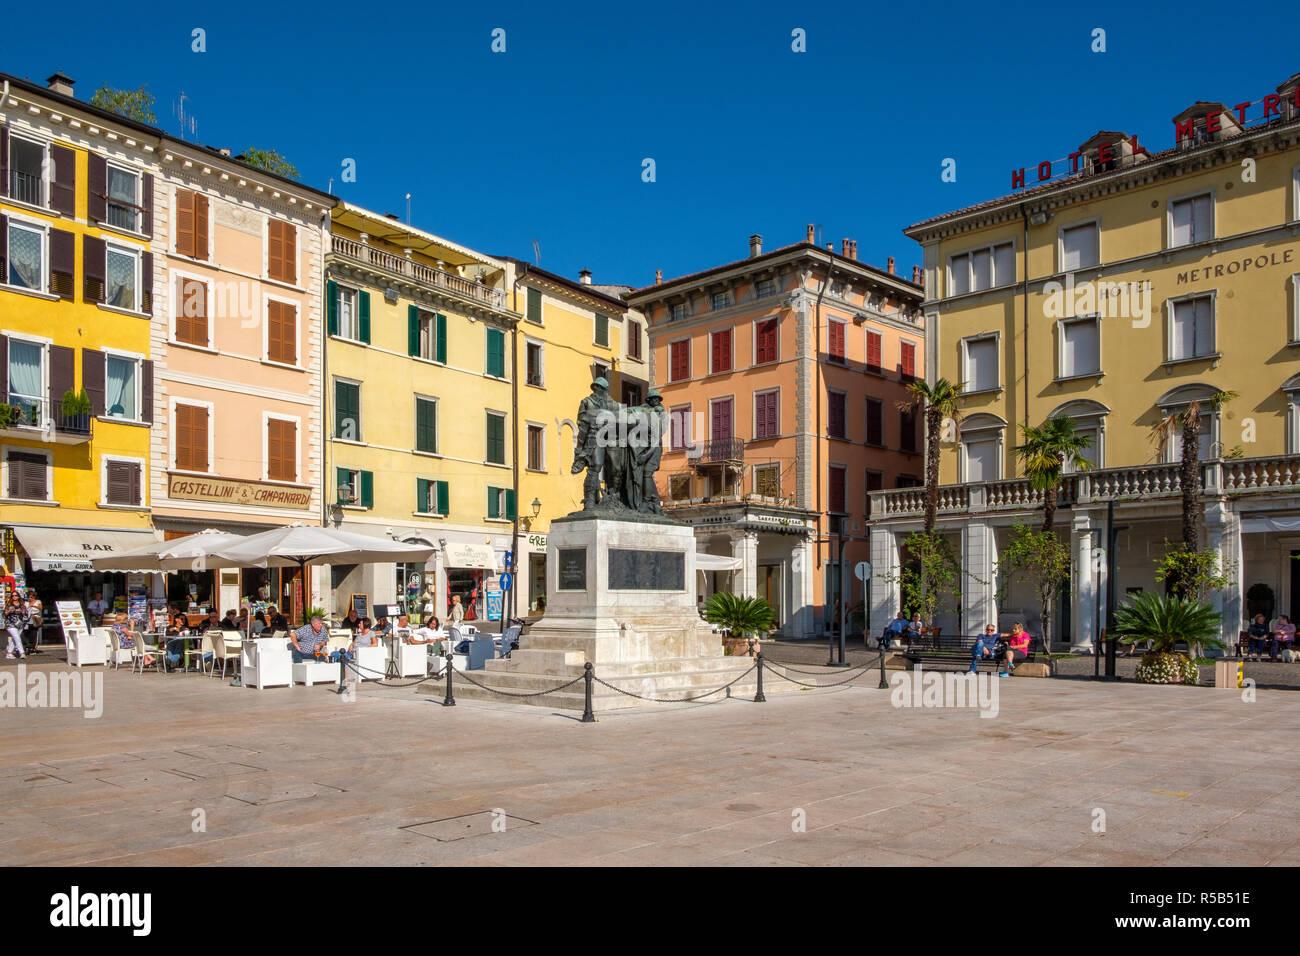 Piazza della Vittoria, Salò, Lago de Garda, provincia de Brescia, Lombardía, Italia Foto de stock